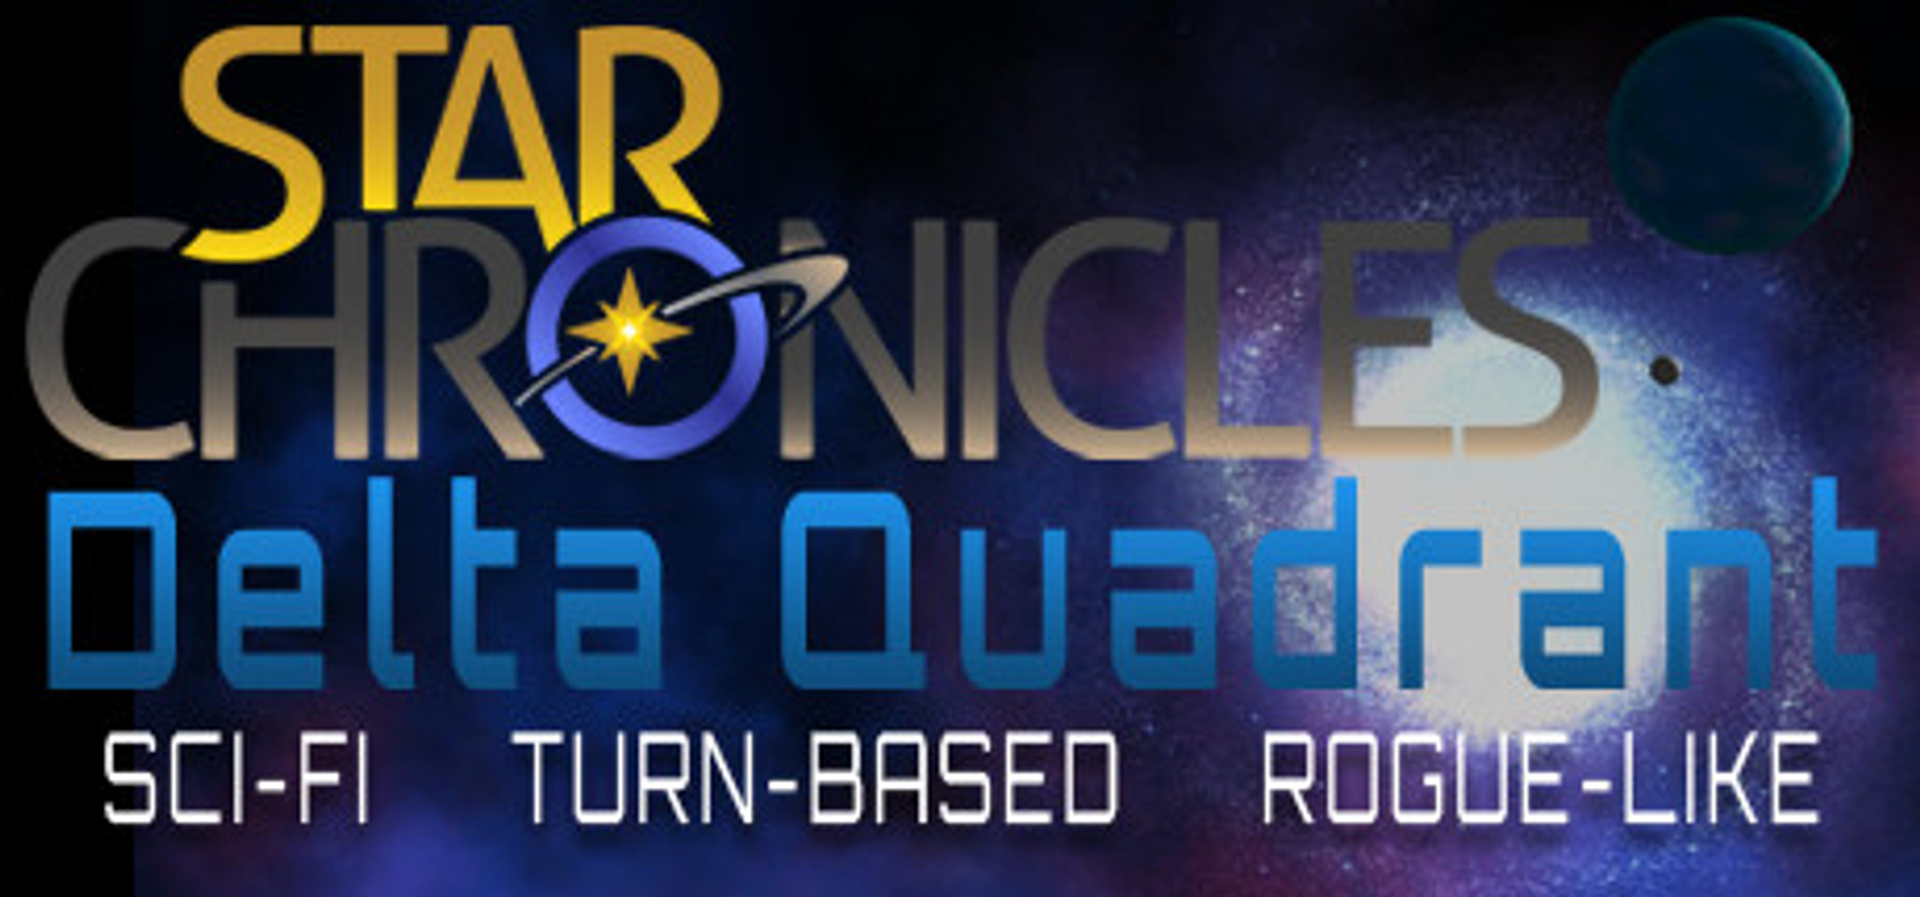 buy Star Chronicles: Delta Quadrant cd key for pc platform